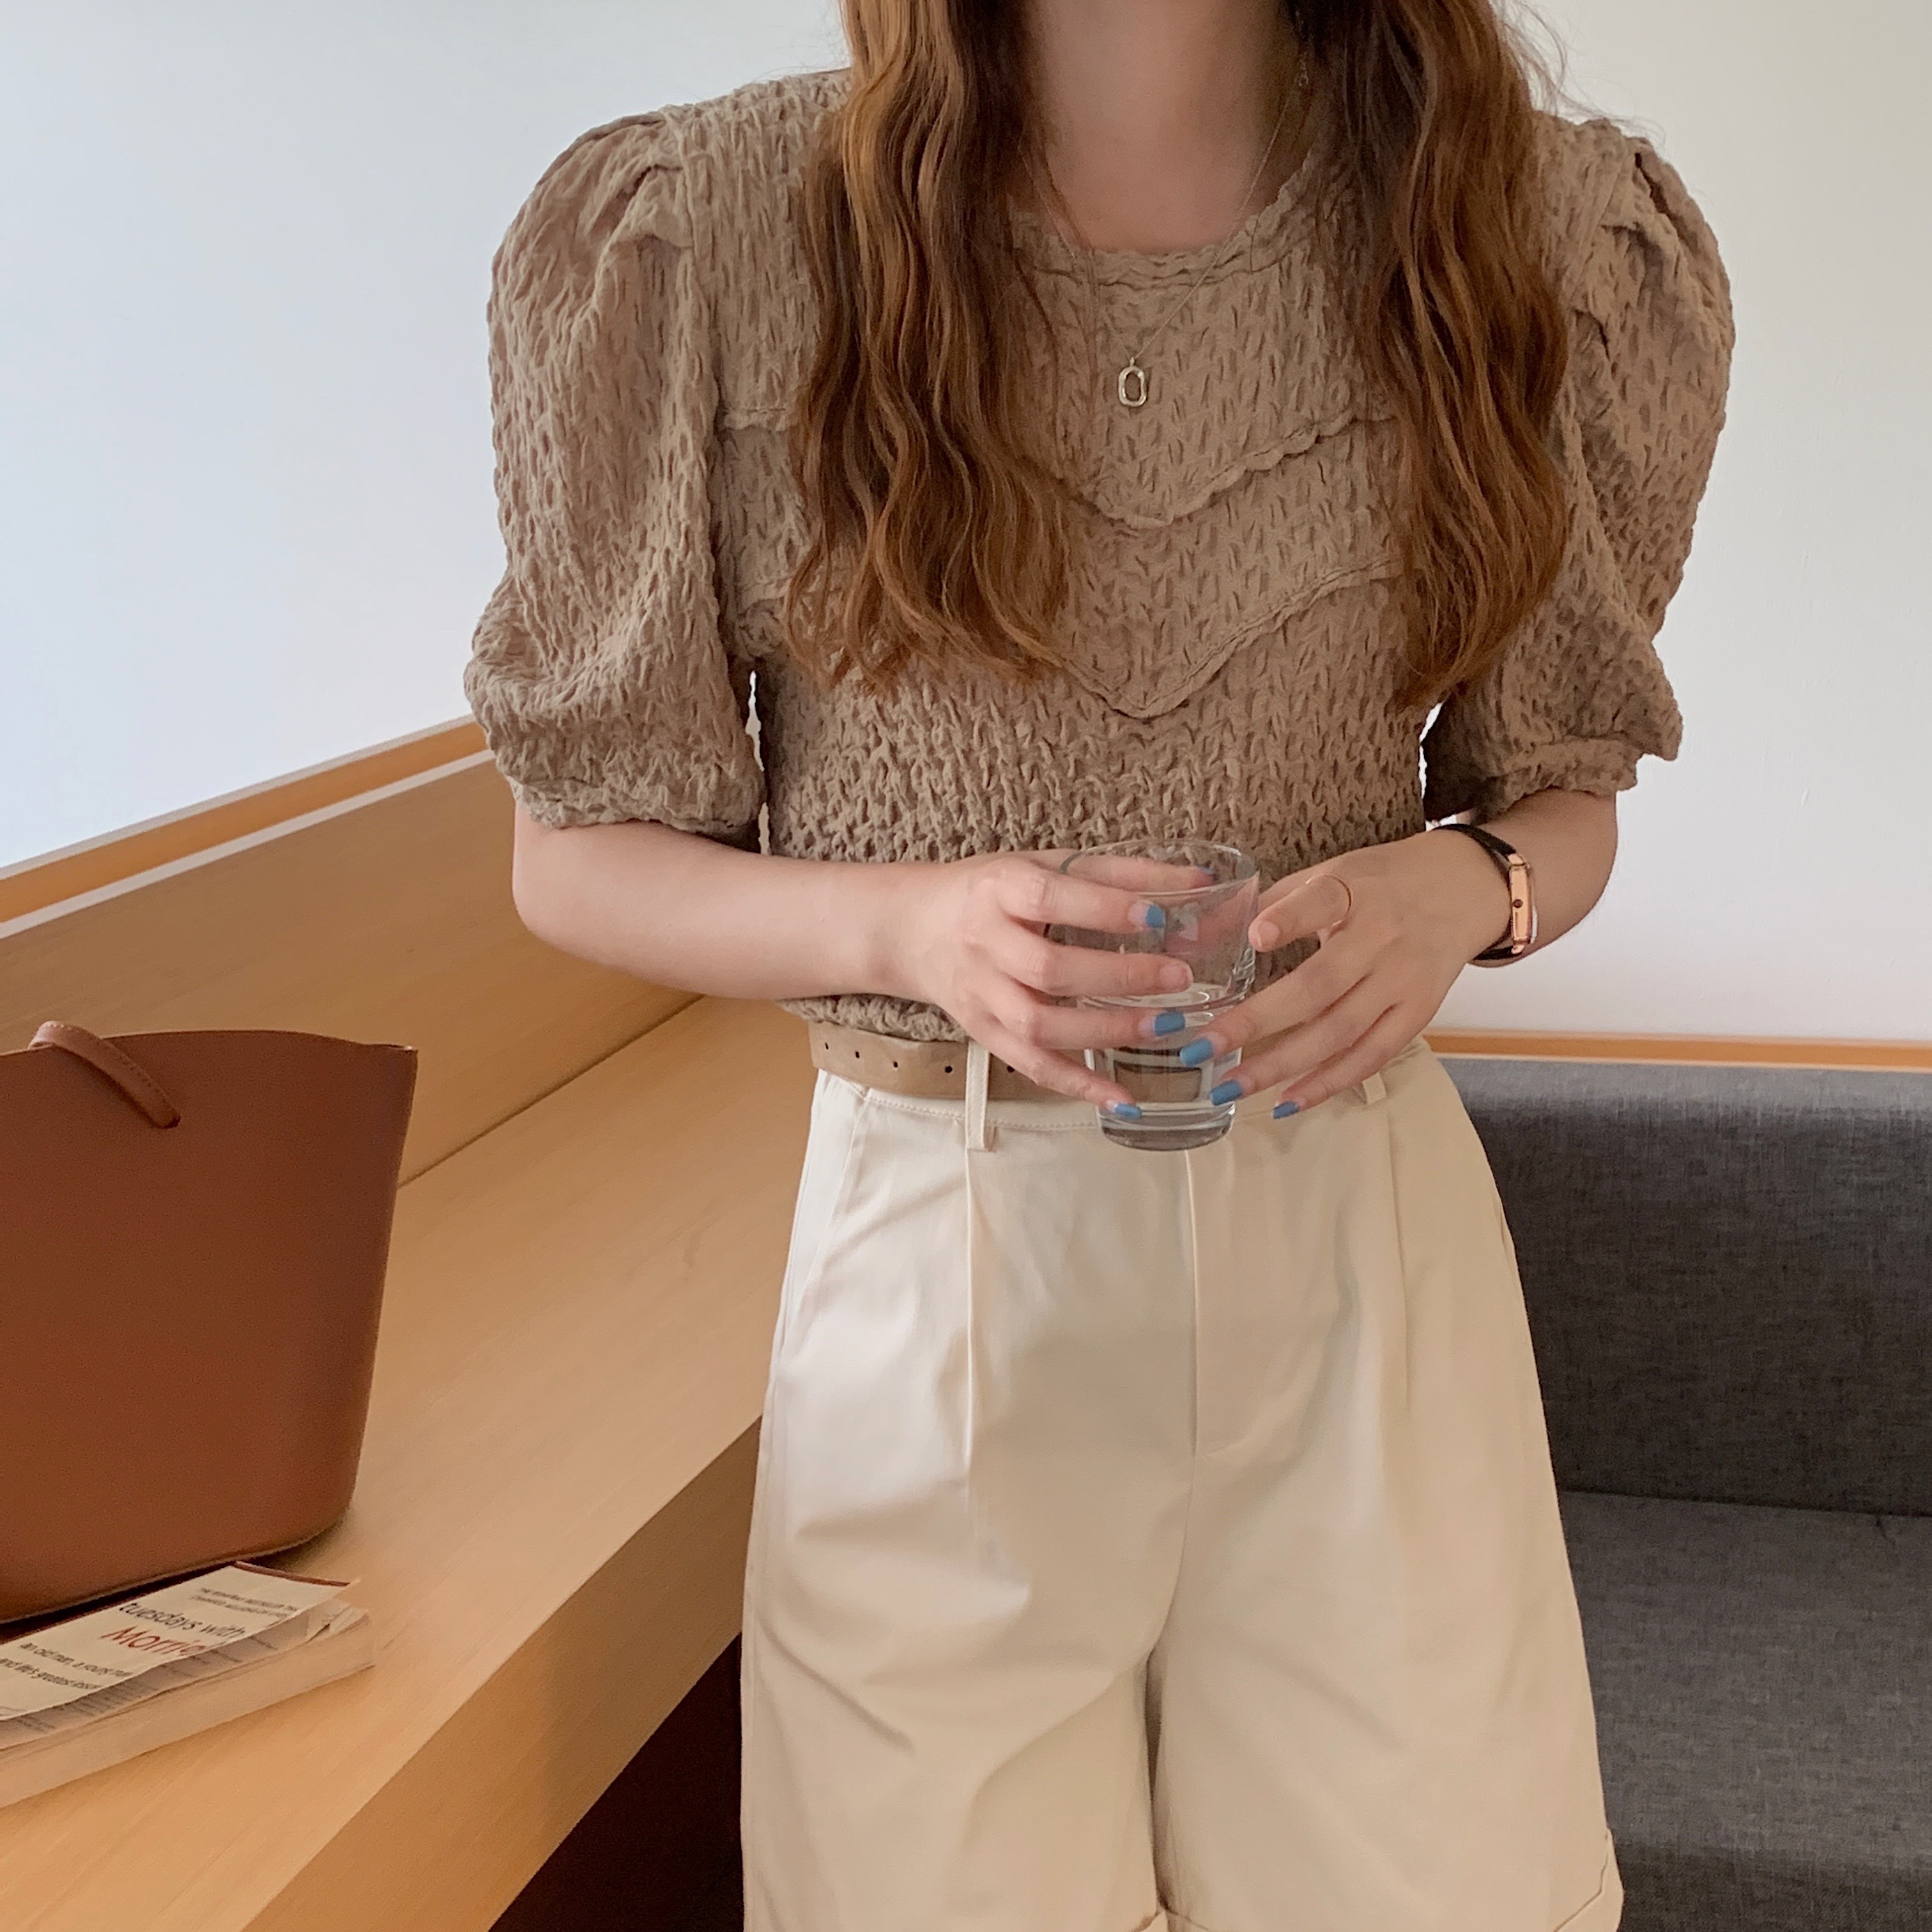 H0cfaae67db7b437fa01553d9cec4943cw - Summer O-Neck Short Sleeves Pleated Blouse